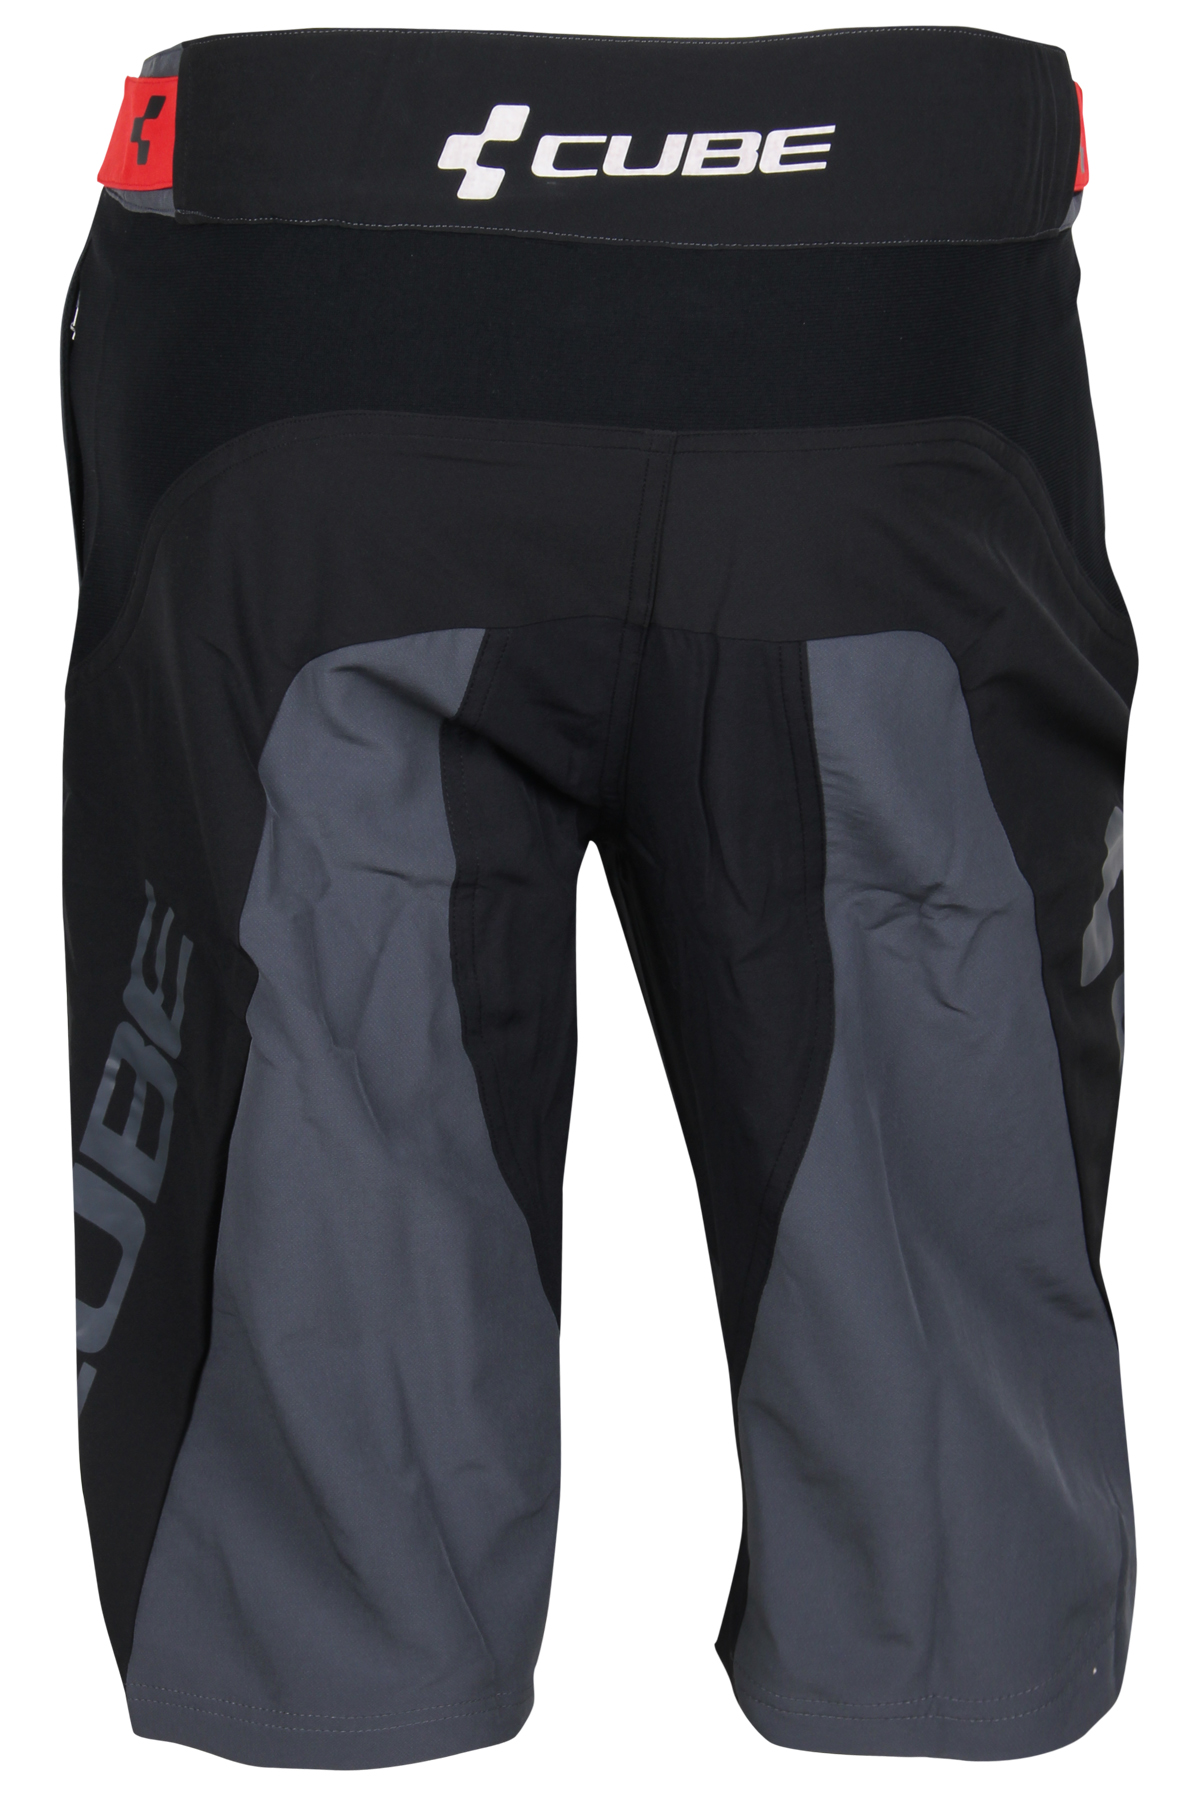 cube herren fahrrad hose kurz shorts blackline 11183. Black Bedroom Furniture Sets. Home Design Ideas